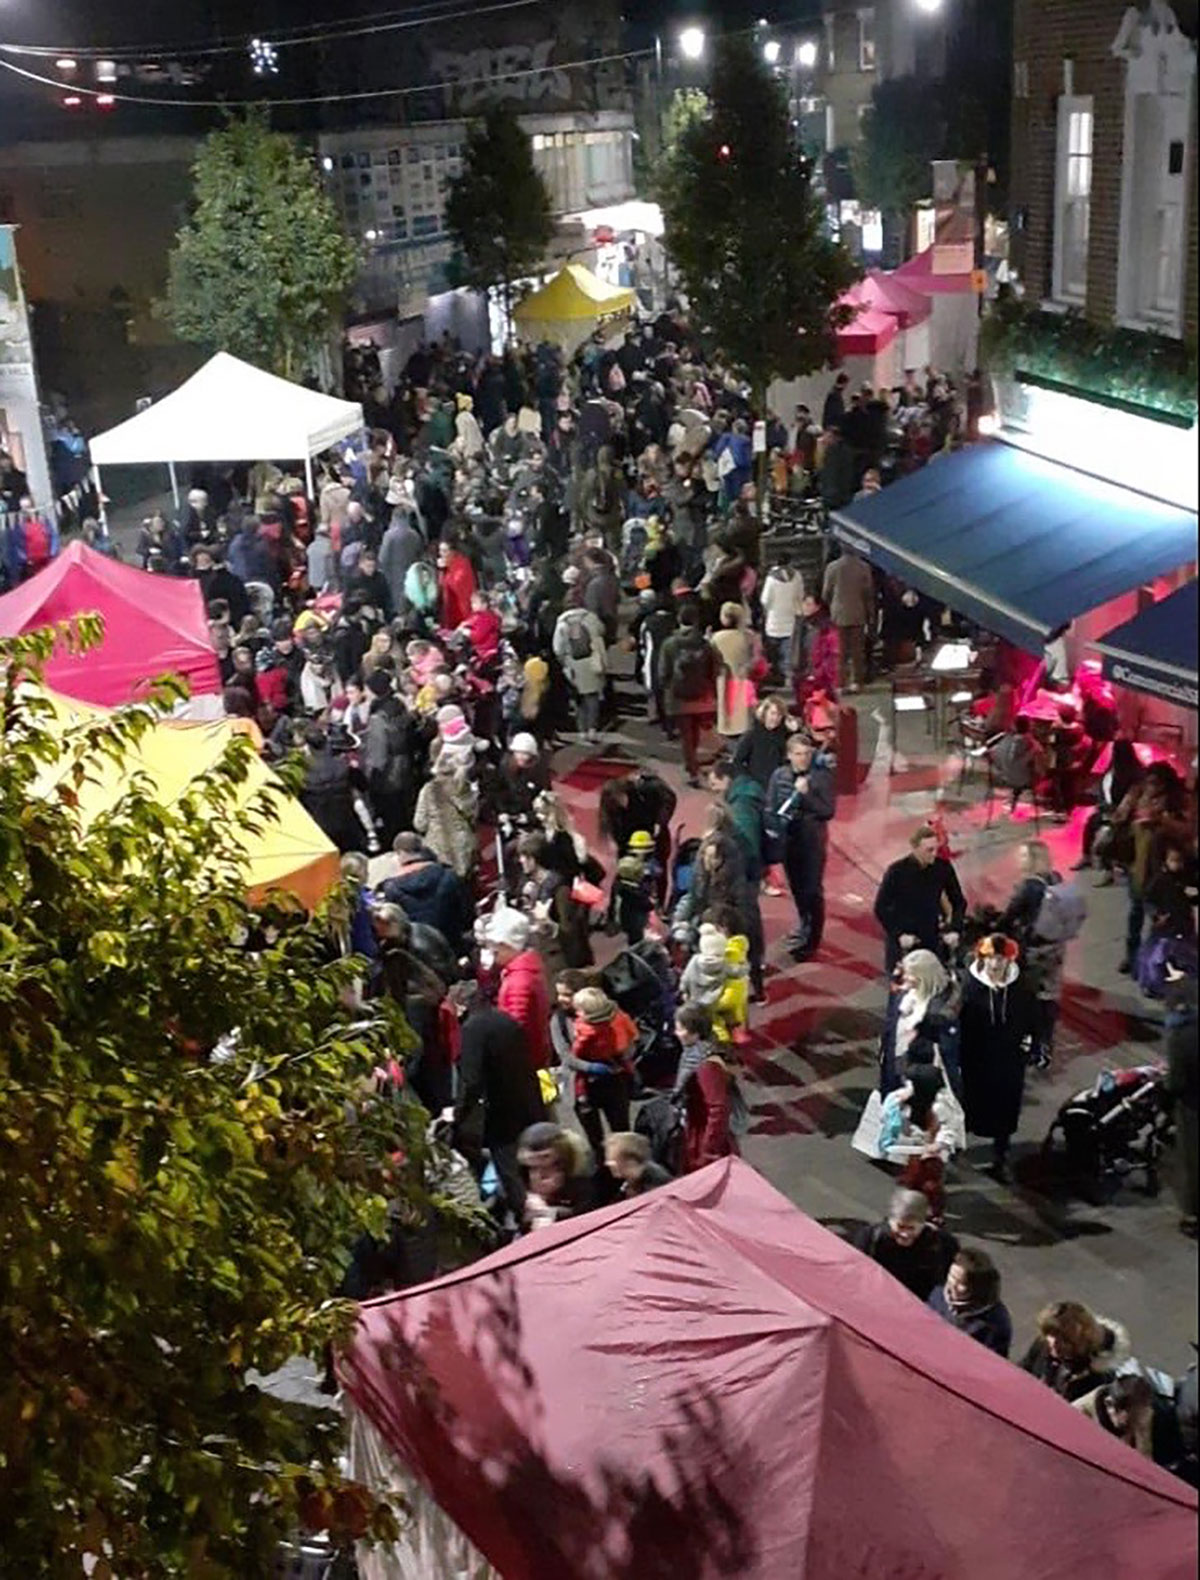 Herne Hill halloween 2019 - crowd on Railton Road